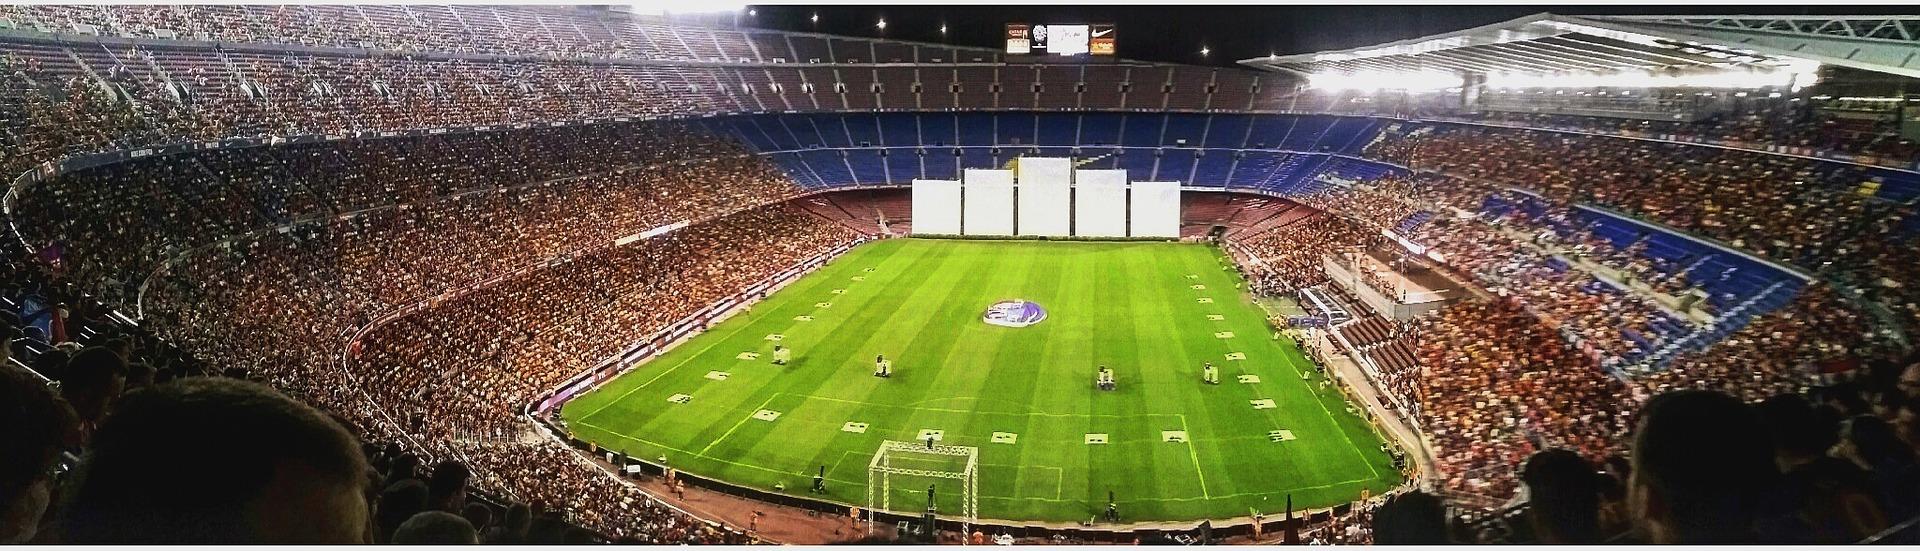 barcelona-1984632_1920